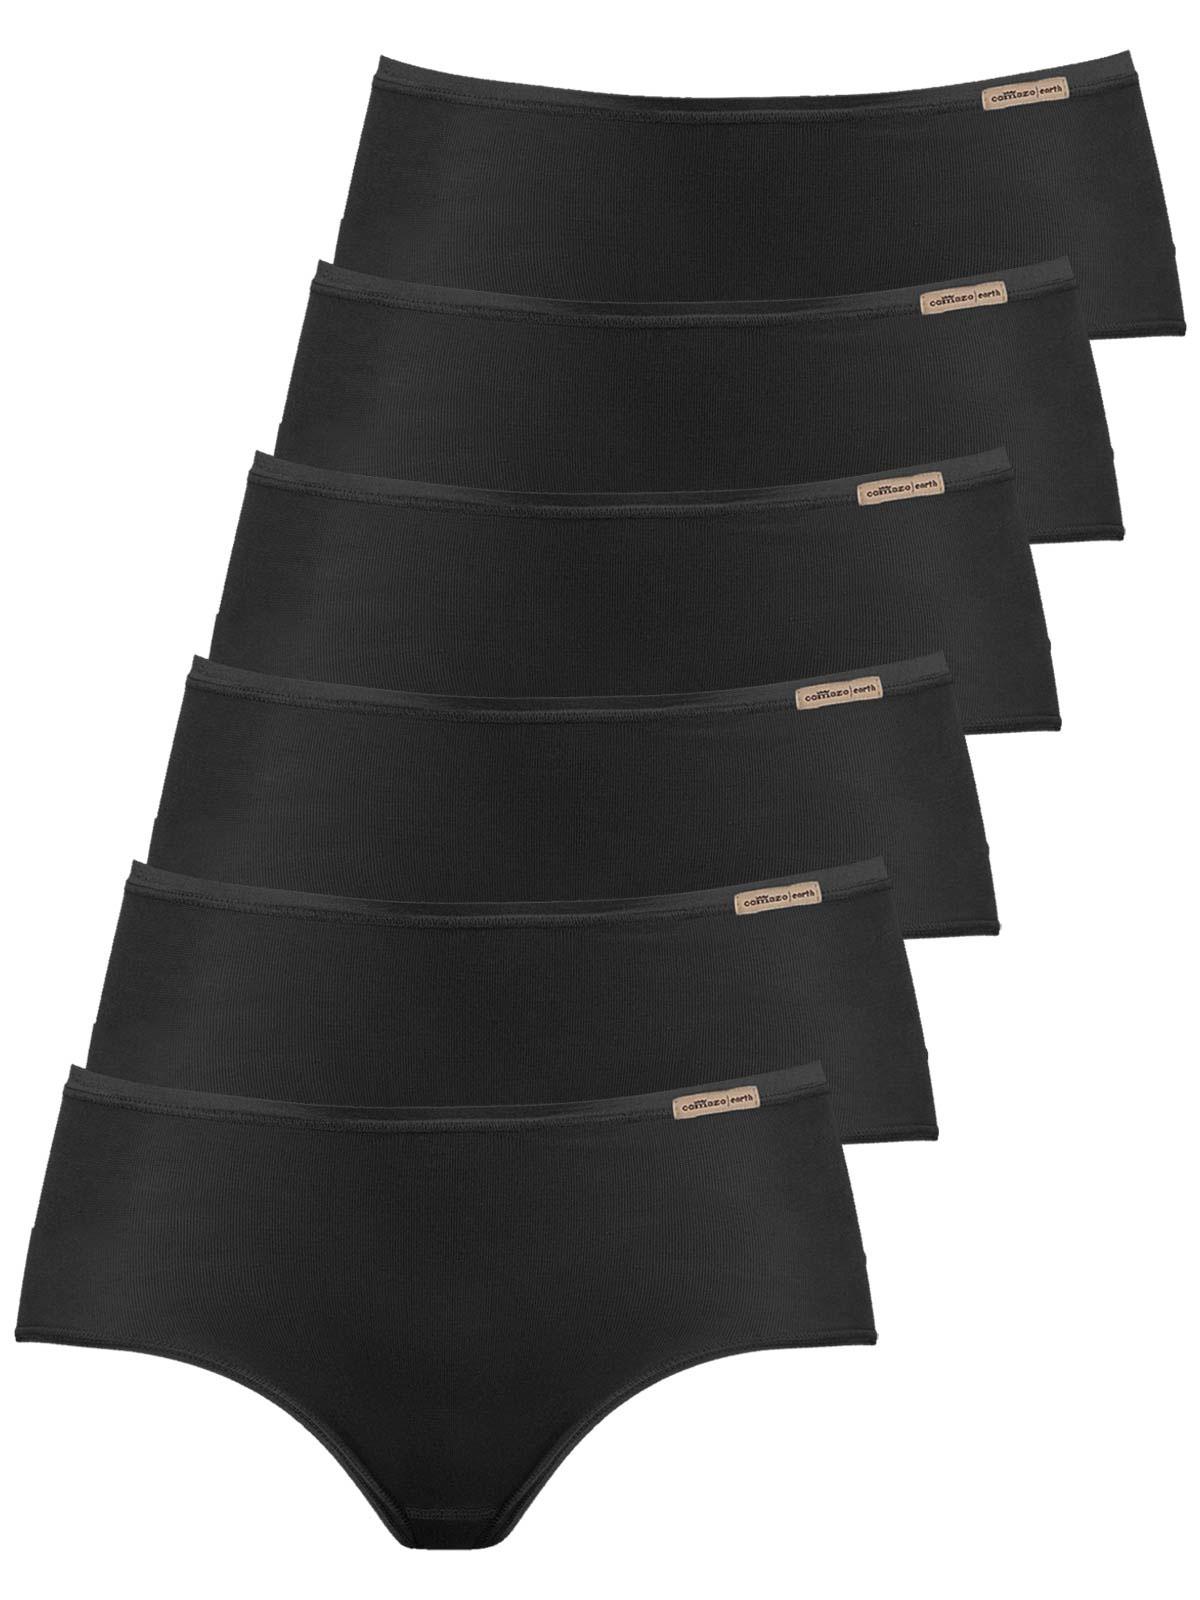 comazo earth 6er Sparpack Damen Panty 1092764, Gr.42, schwarz